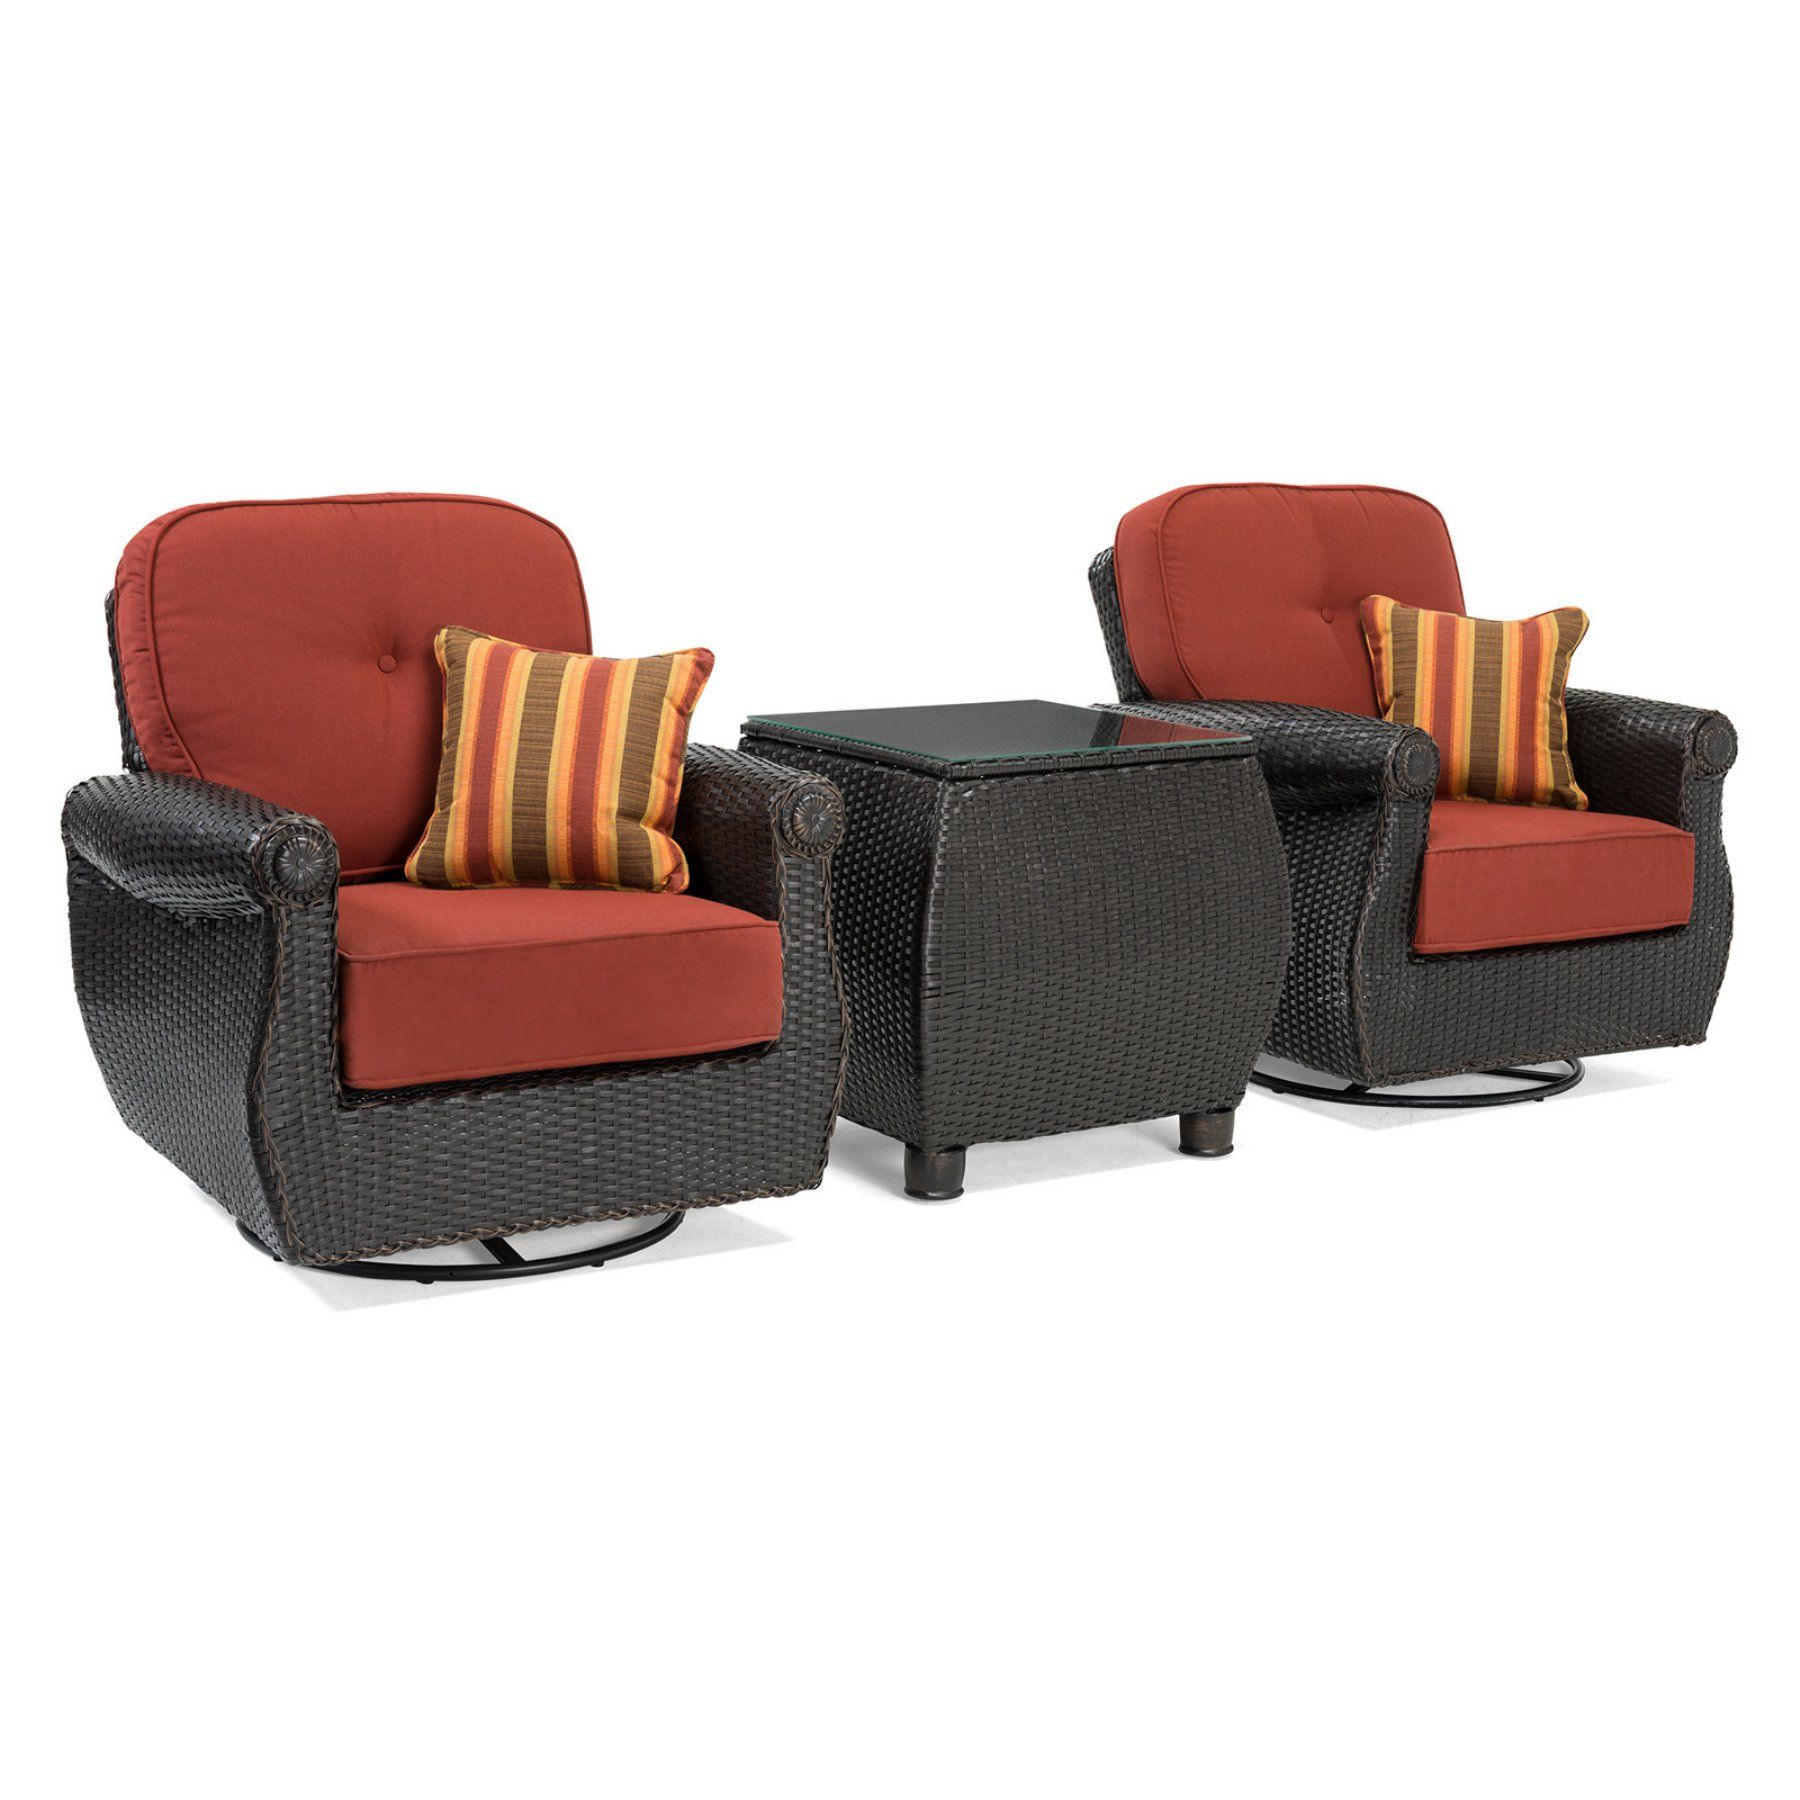 Outdoor La Z Boy Breckenridge Wicker 3 Piece Patio Swivel Rocker Convers Wicker Patio Furniture Set Resin Wicker Patio Furniture